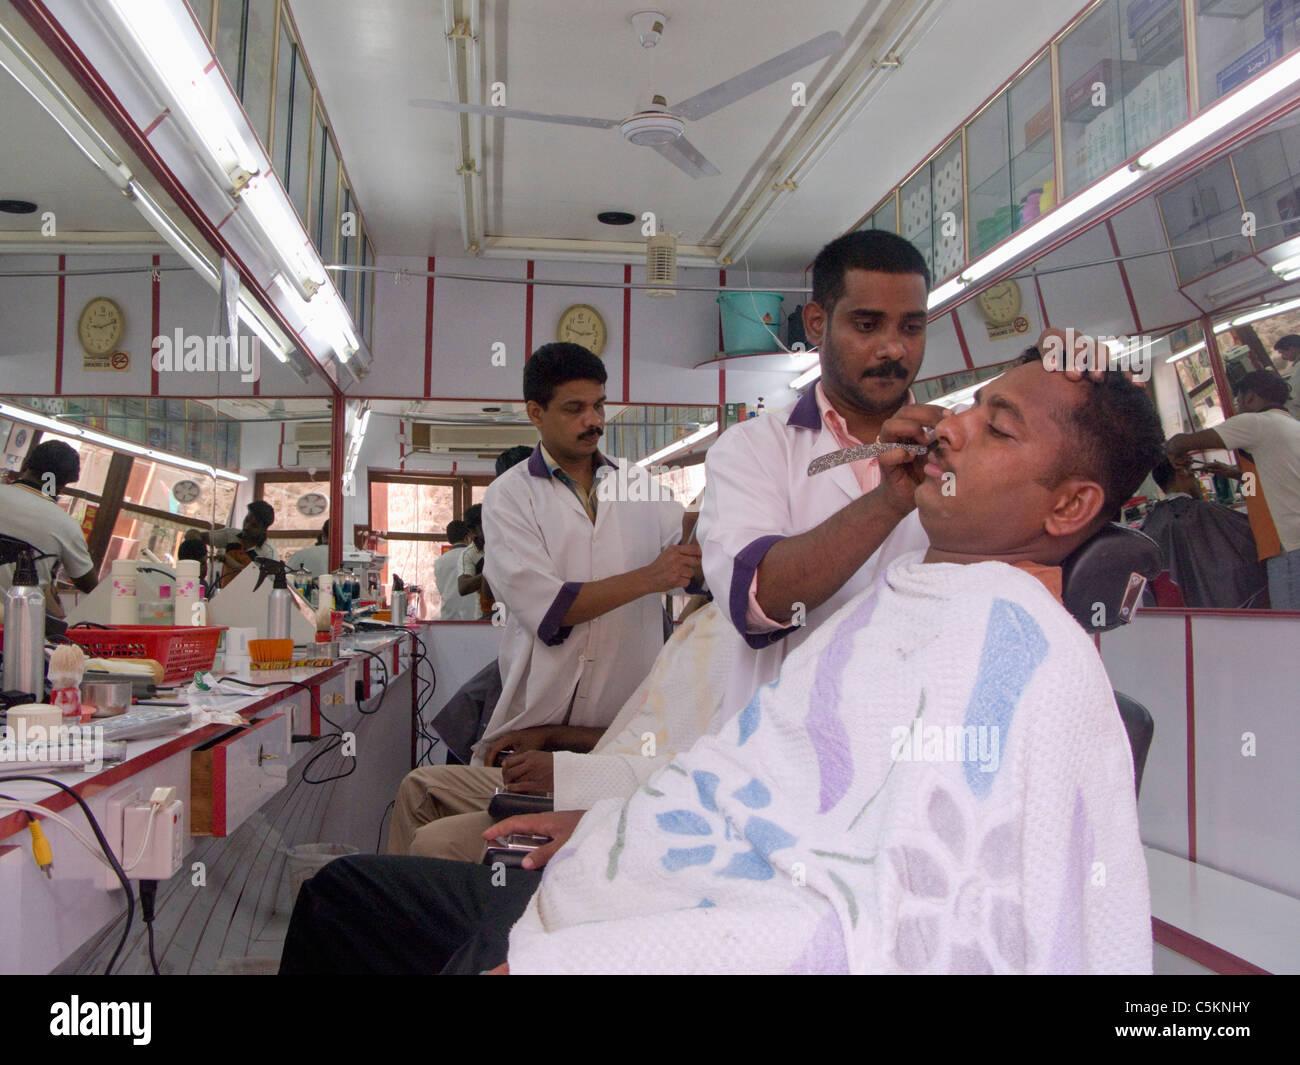 Salon De Coiffure Homme D Etre Rase Avec Un Rasoir Fardee Dubai